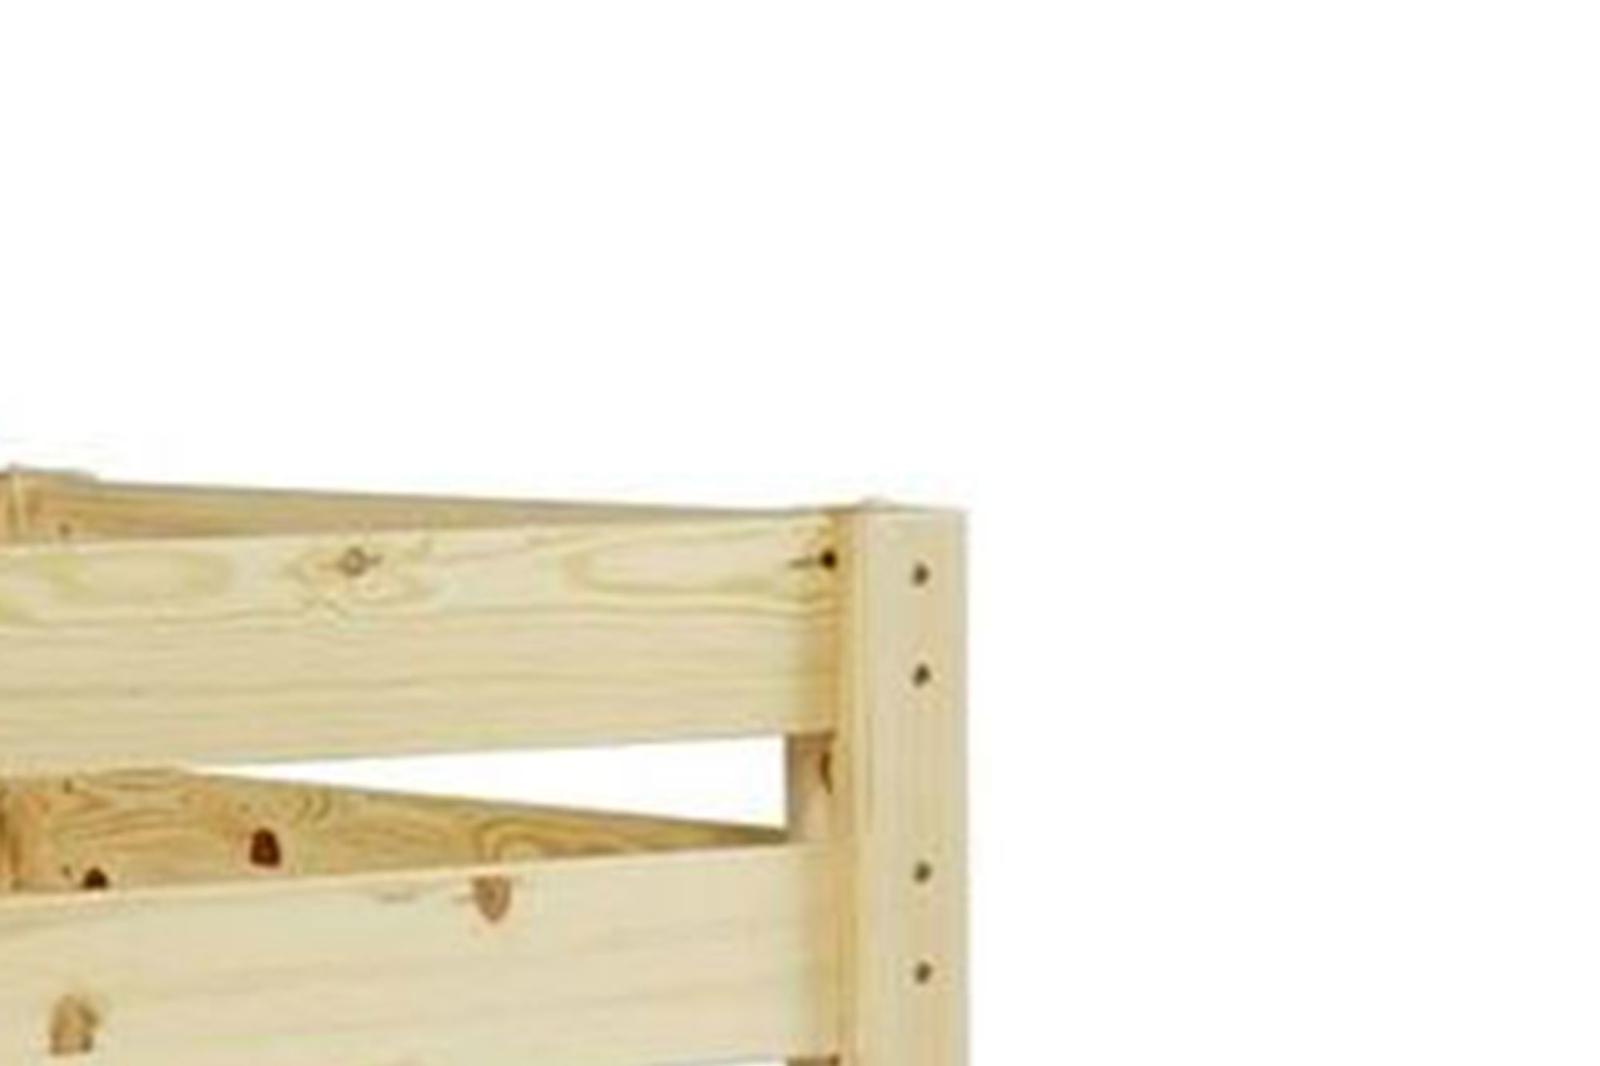 Kinderbett Mit Rausfallschutz kinderbett massivholz mit rausfallschutz moby günstig bestellen